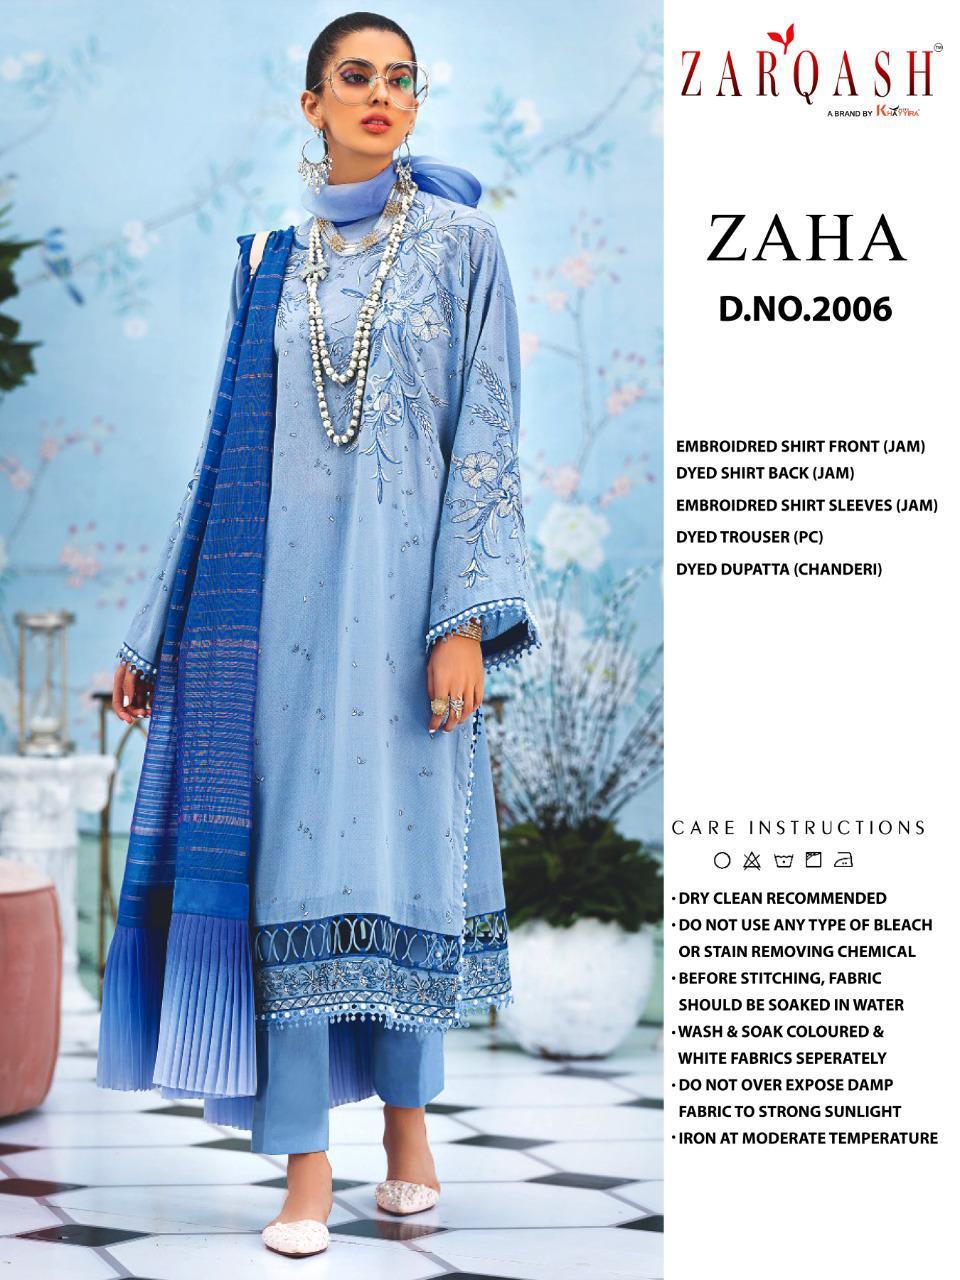 Zarqash Zaha by Khayyira Salwar Suit Wholesale Catalog 4 Pcs 3 - Zarqash Zaha by Khayyira Salwar Suit Wholesale Catalog 4 Pcs